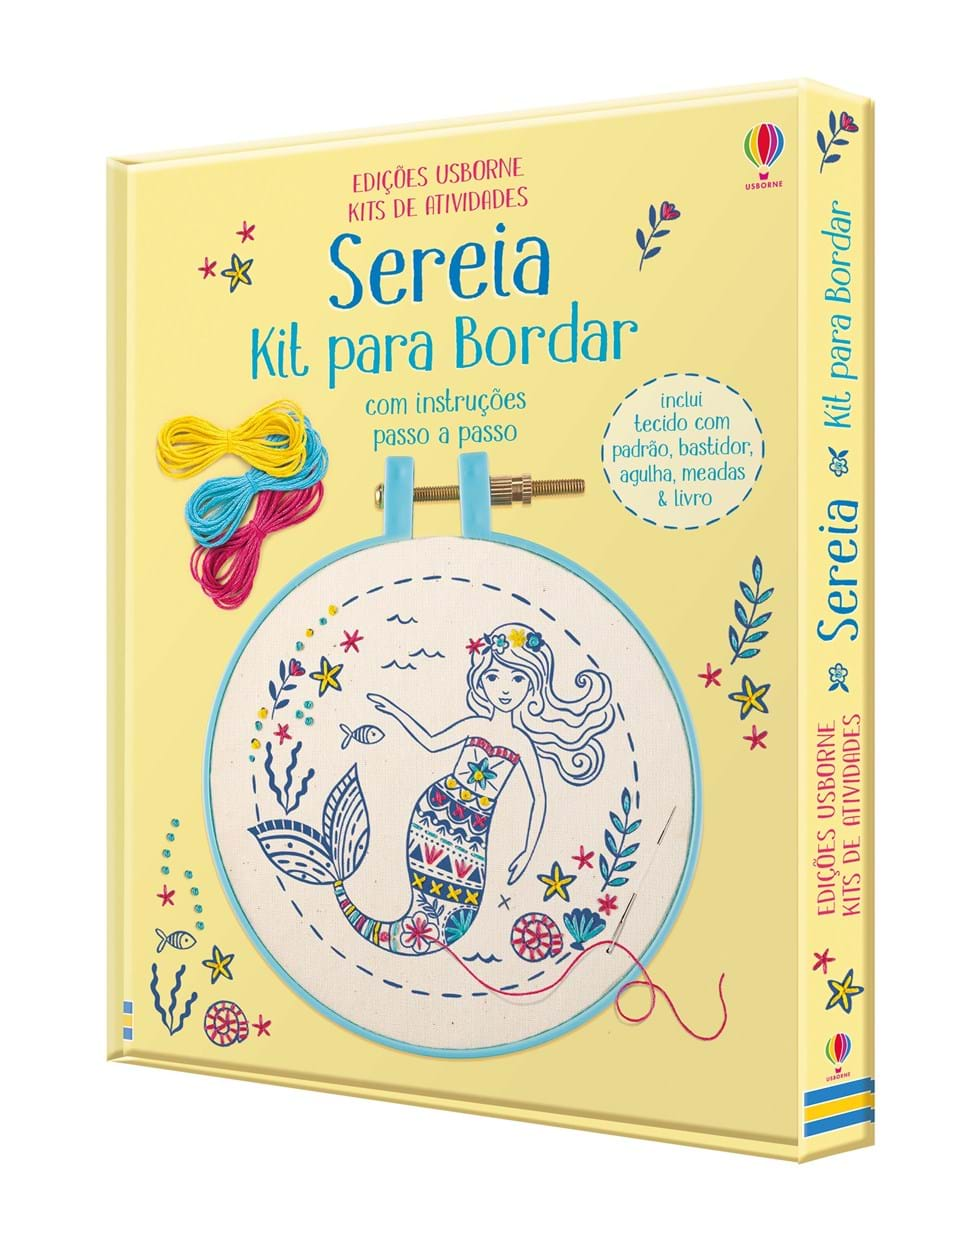 Kit para Bordar: Sereia